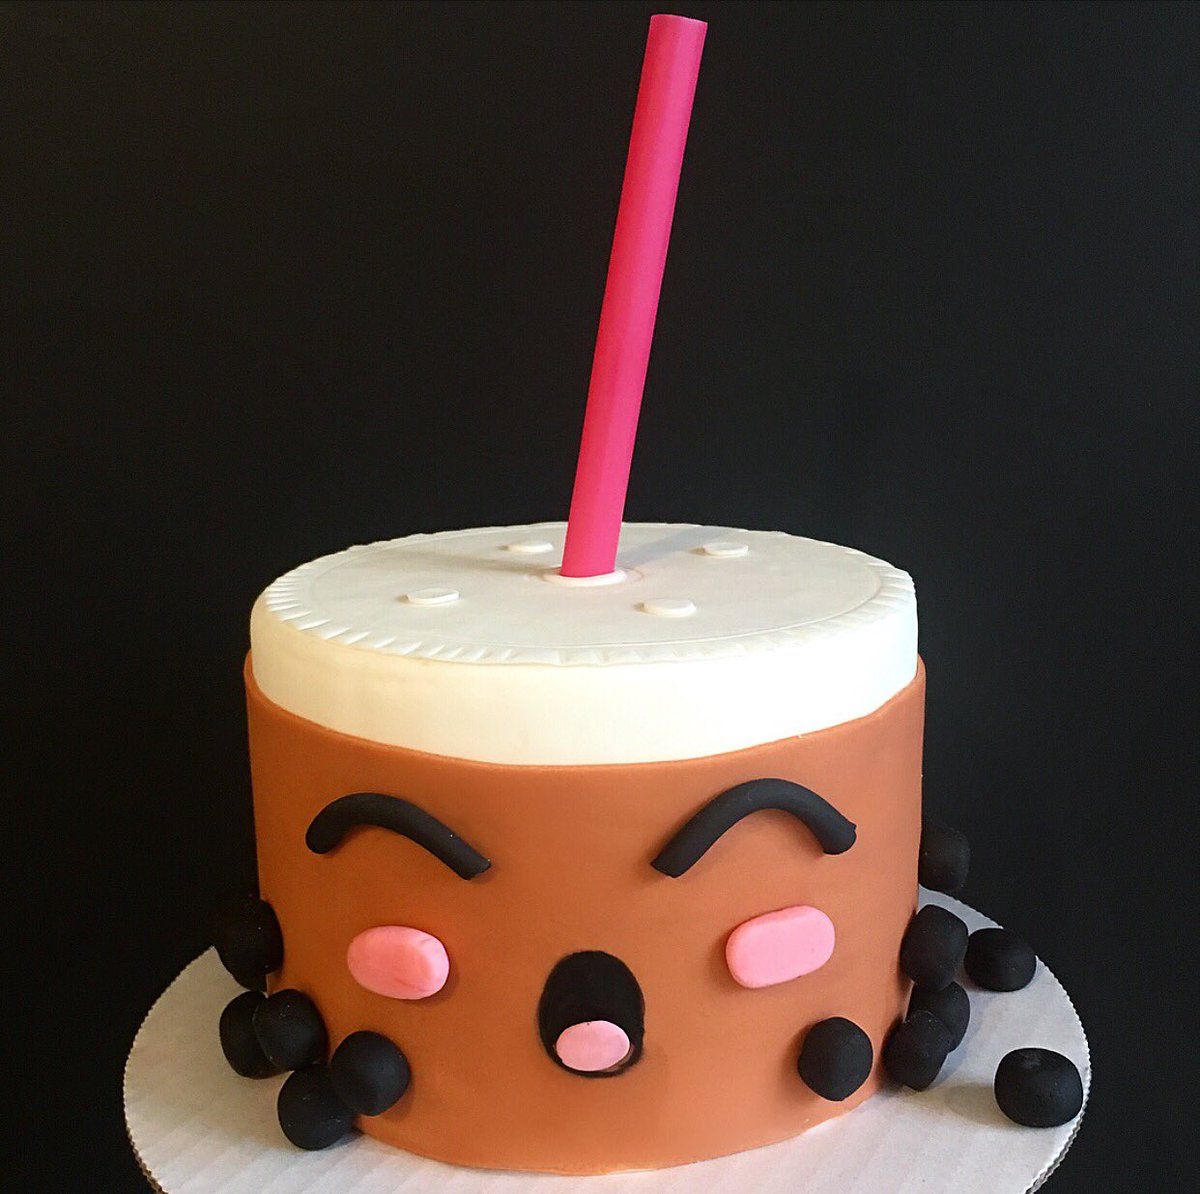 Duffs Cakemix On Twitter This Cake Is Boba Tea Riffic